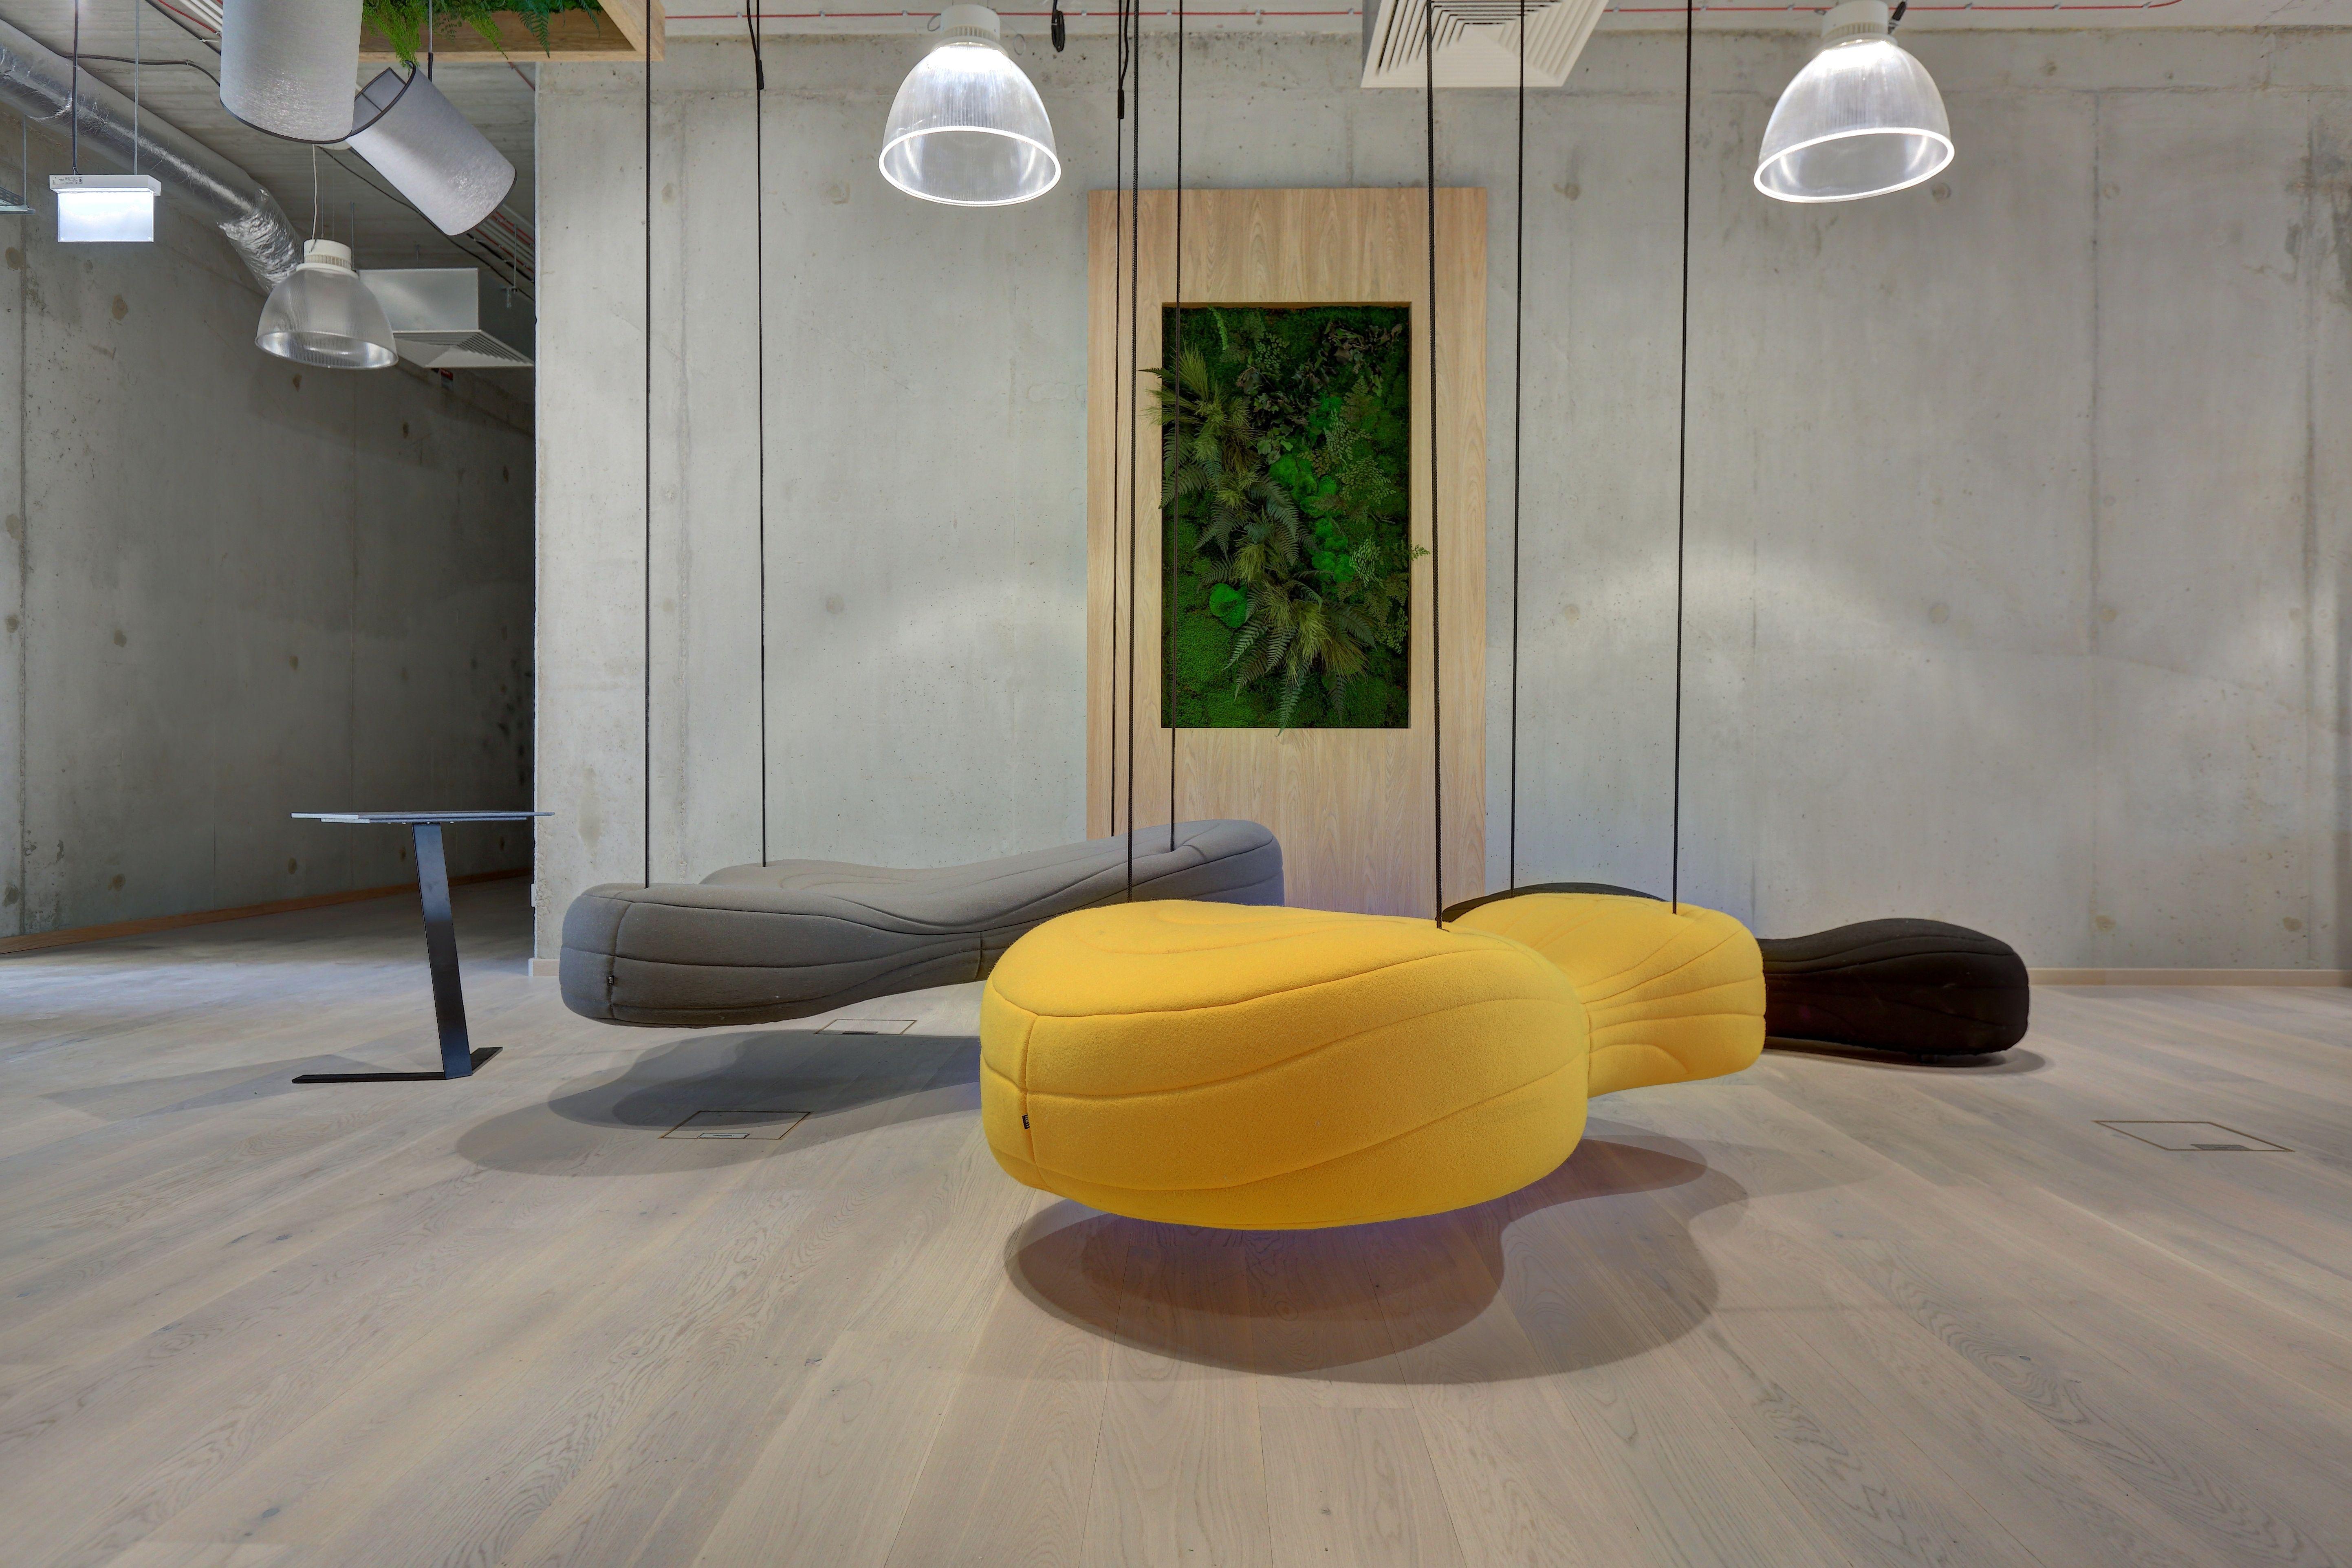 Pin di zeroseven design studios su Work Spaces & Office Design